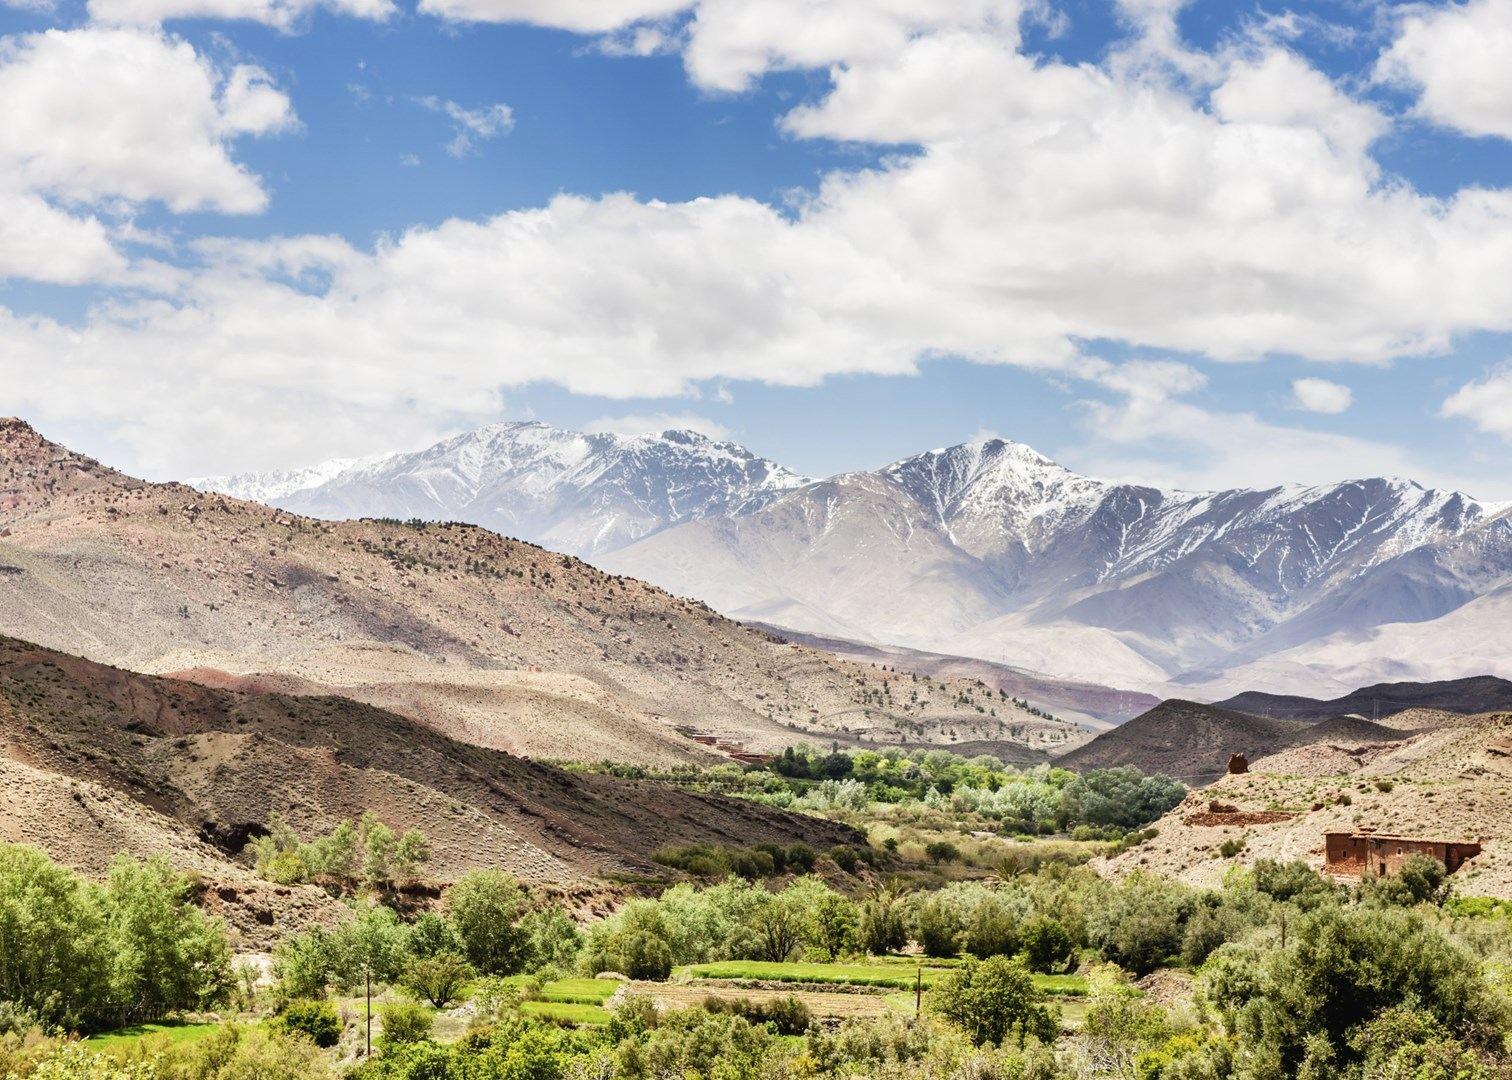 Mountains & Desert